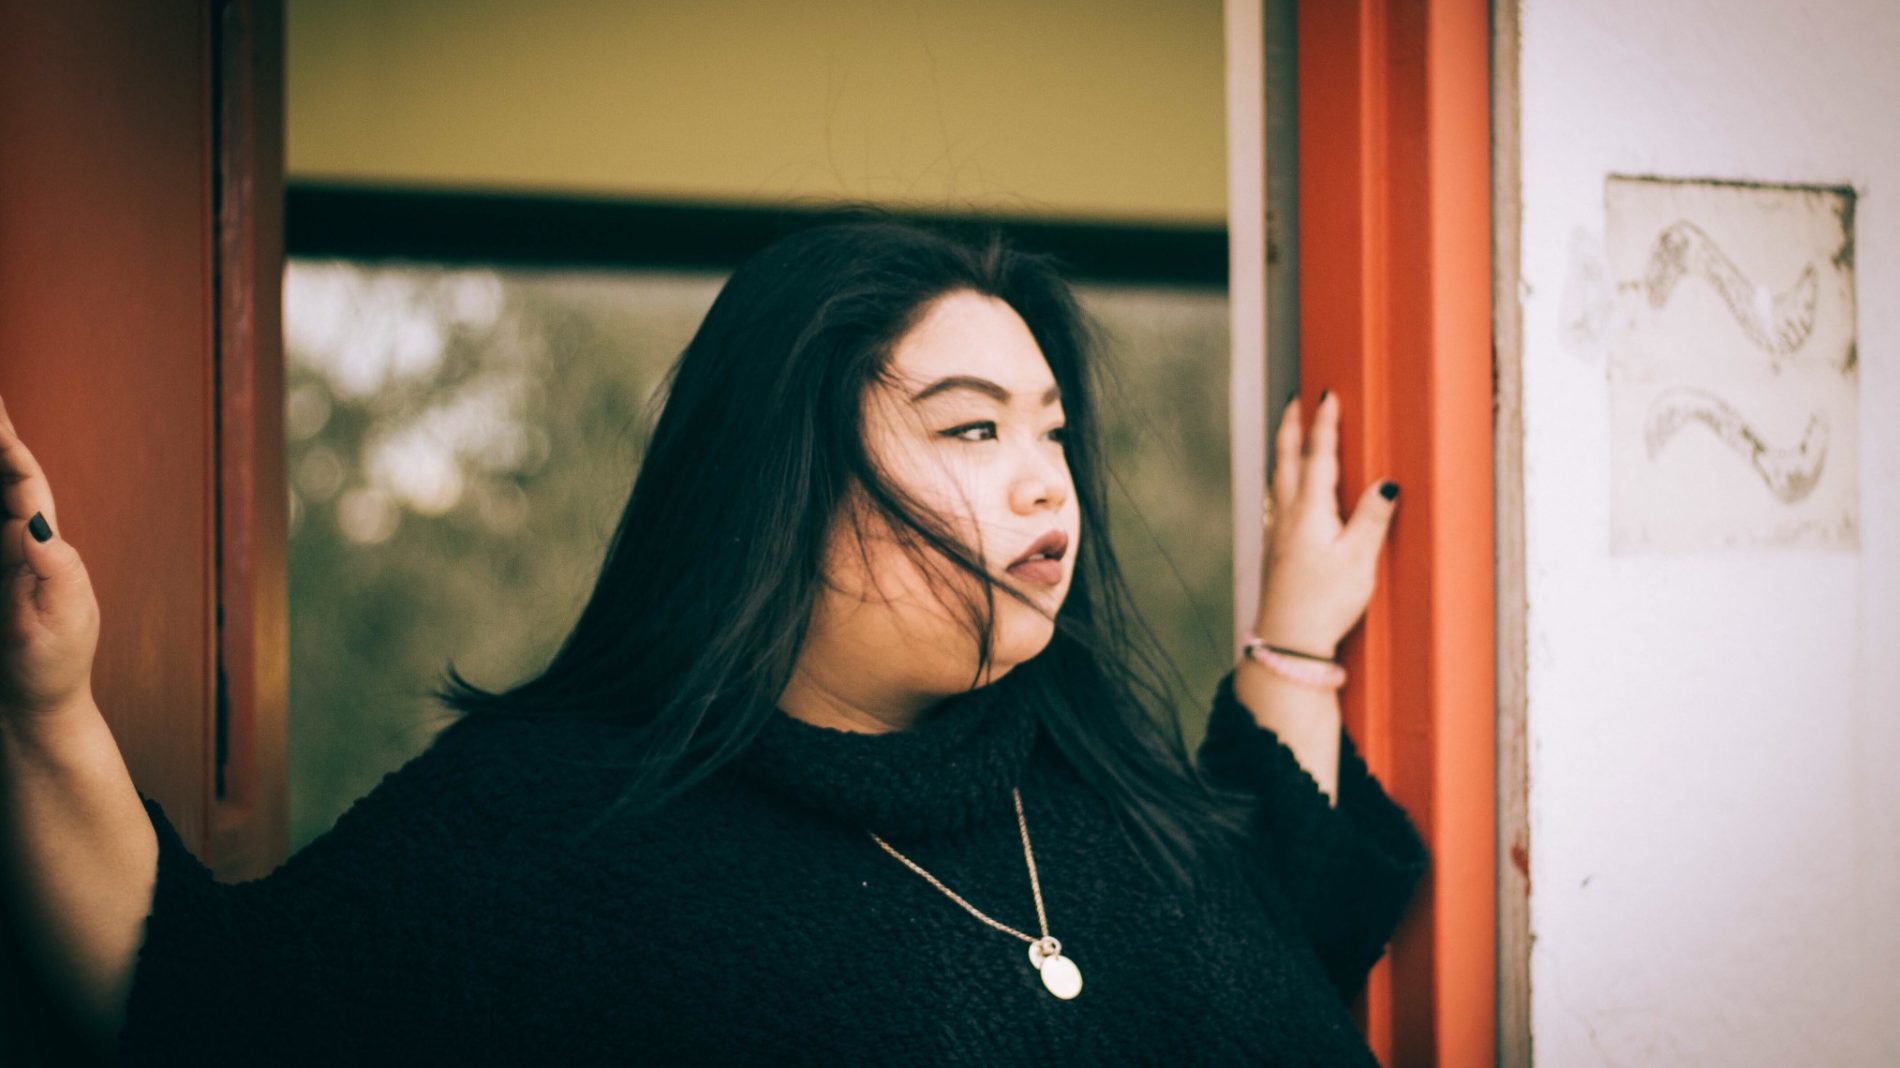 young woman with dark hair standing in doorway